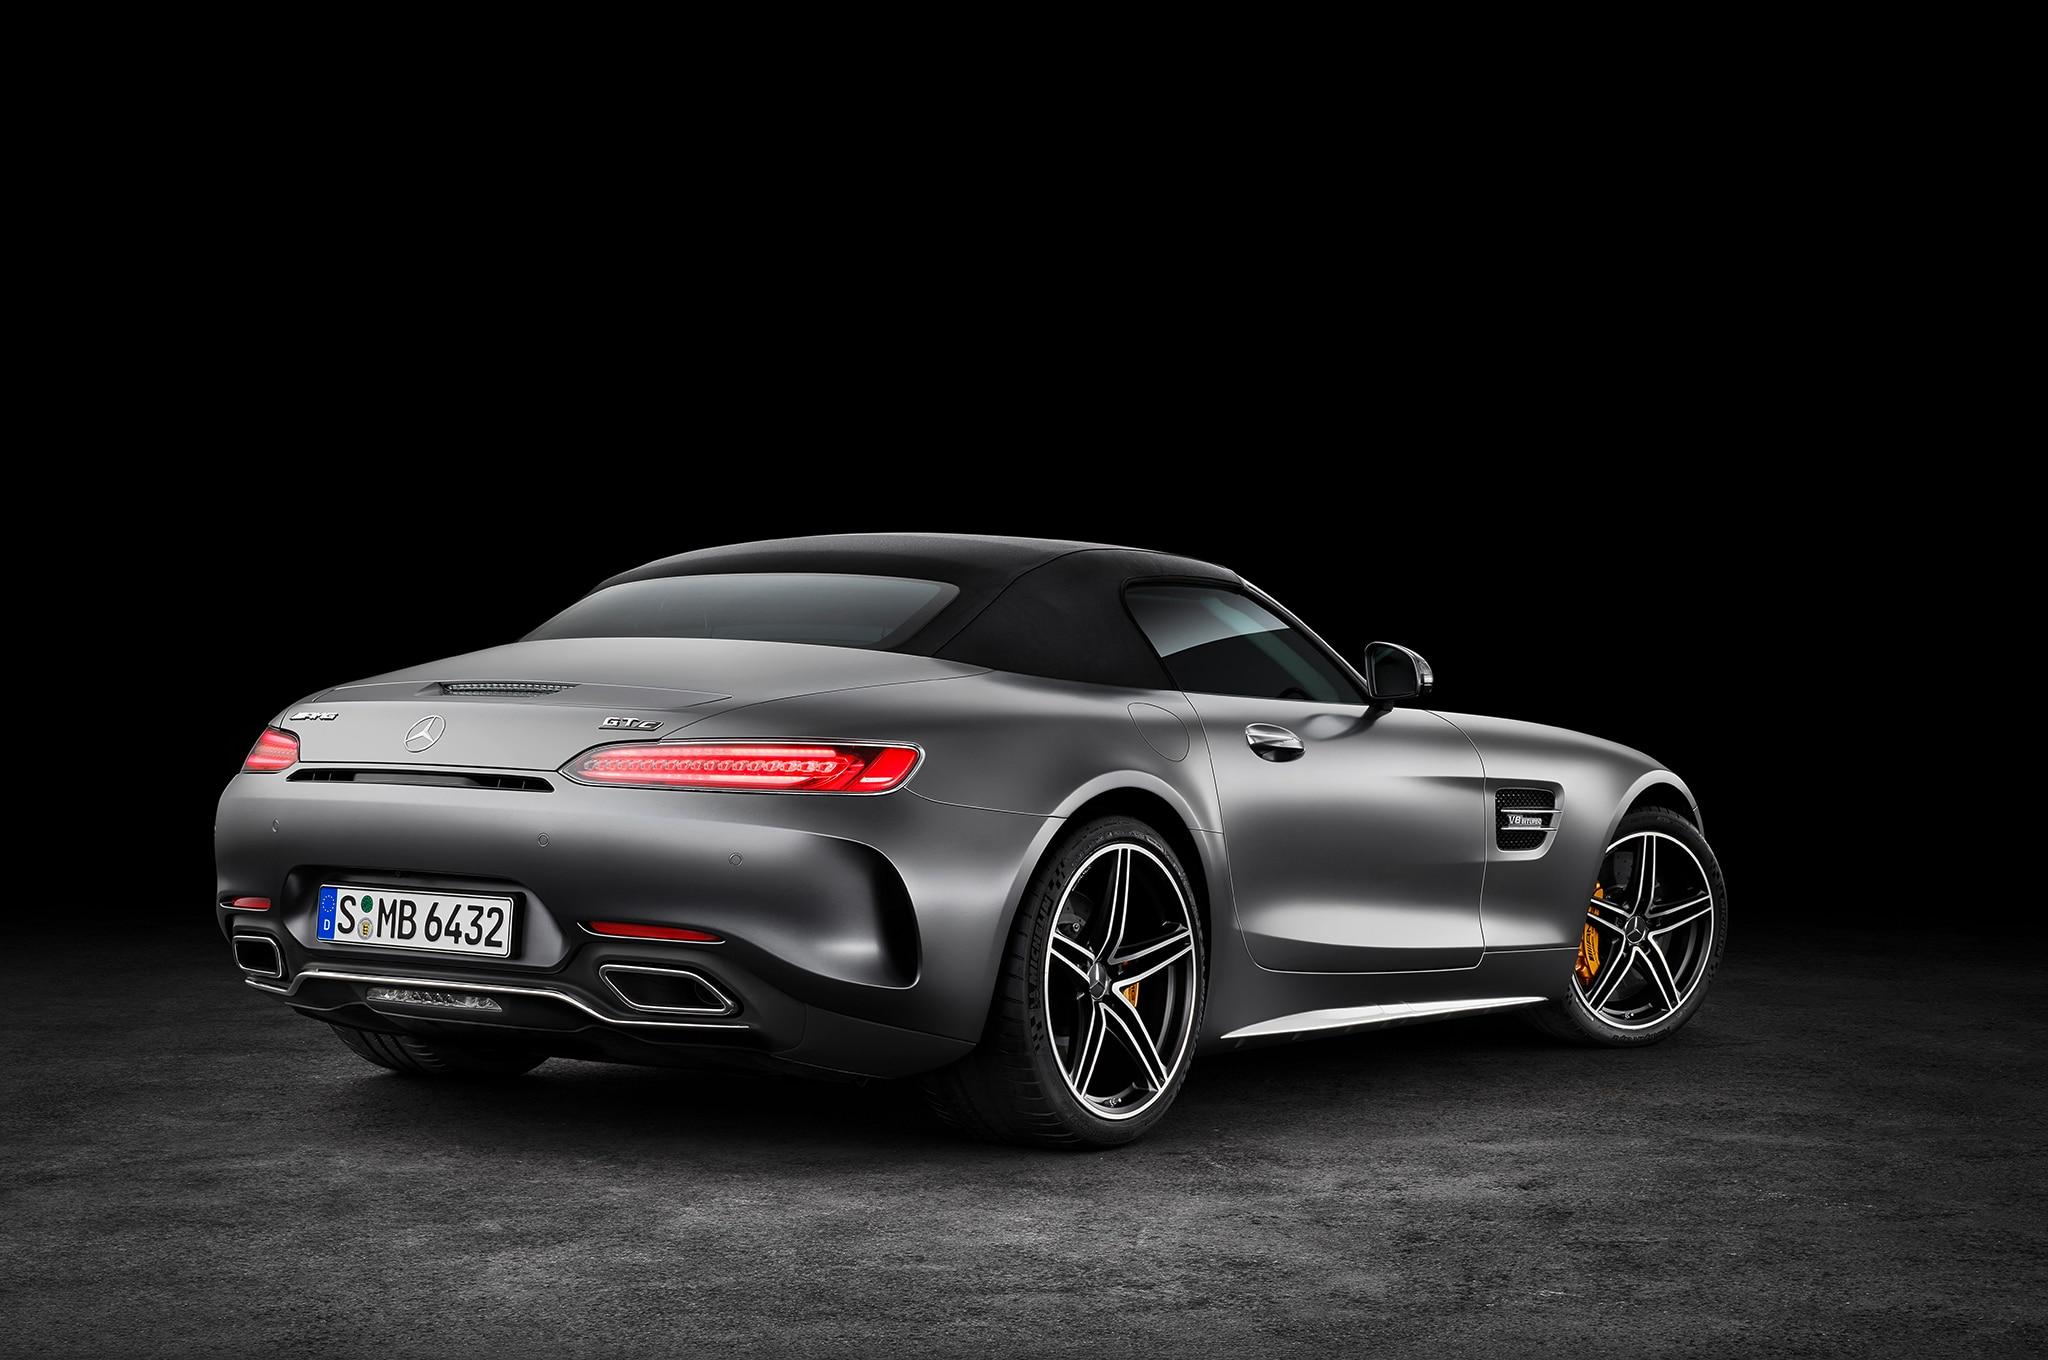 http://st.automobilemag.com/uploads/sites/10/2017/04/2018-Mercedes-AMG-GT-C-Roadster-rear-three-quarter-02.jpg